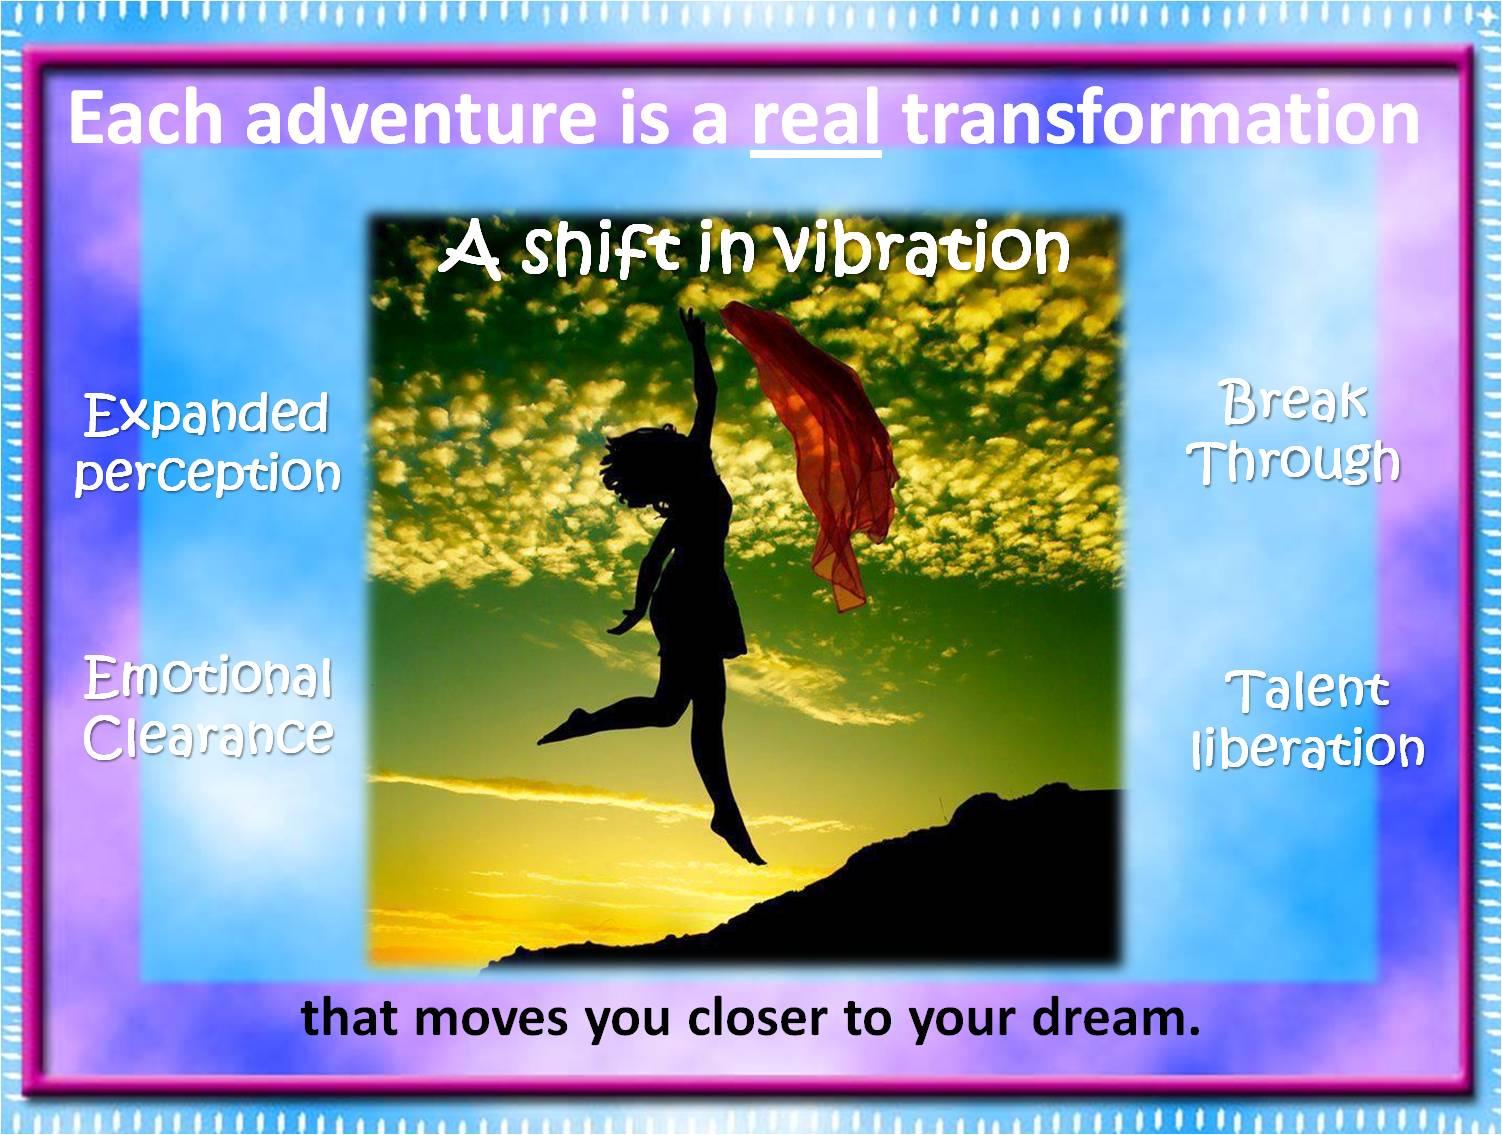 dreamexpress-virtualtourB-slide13-transformation